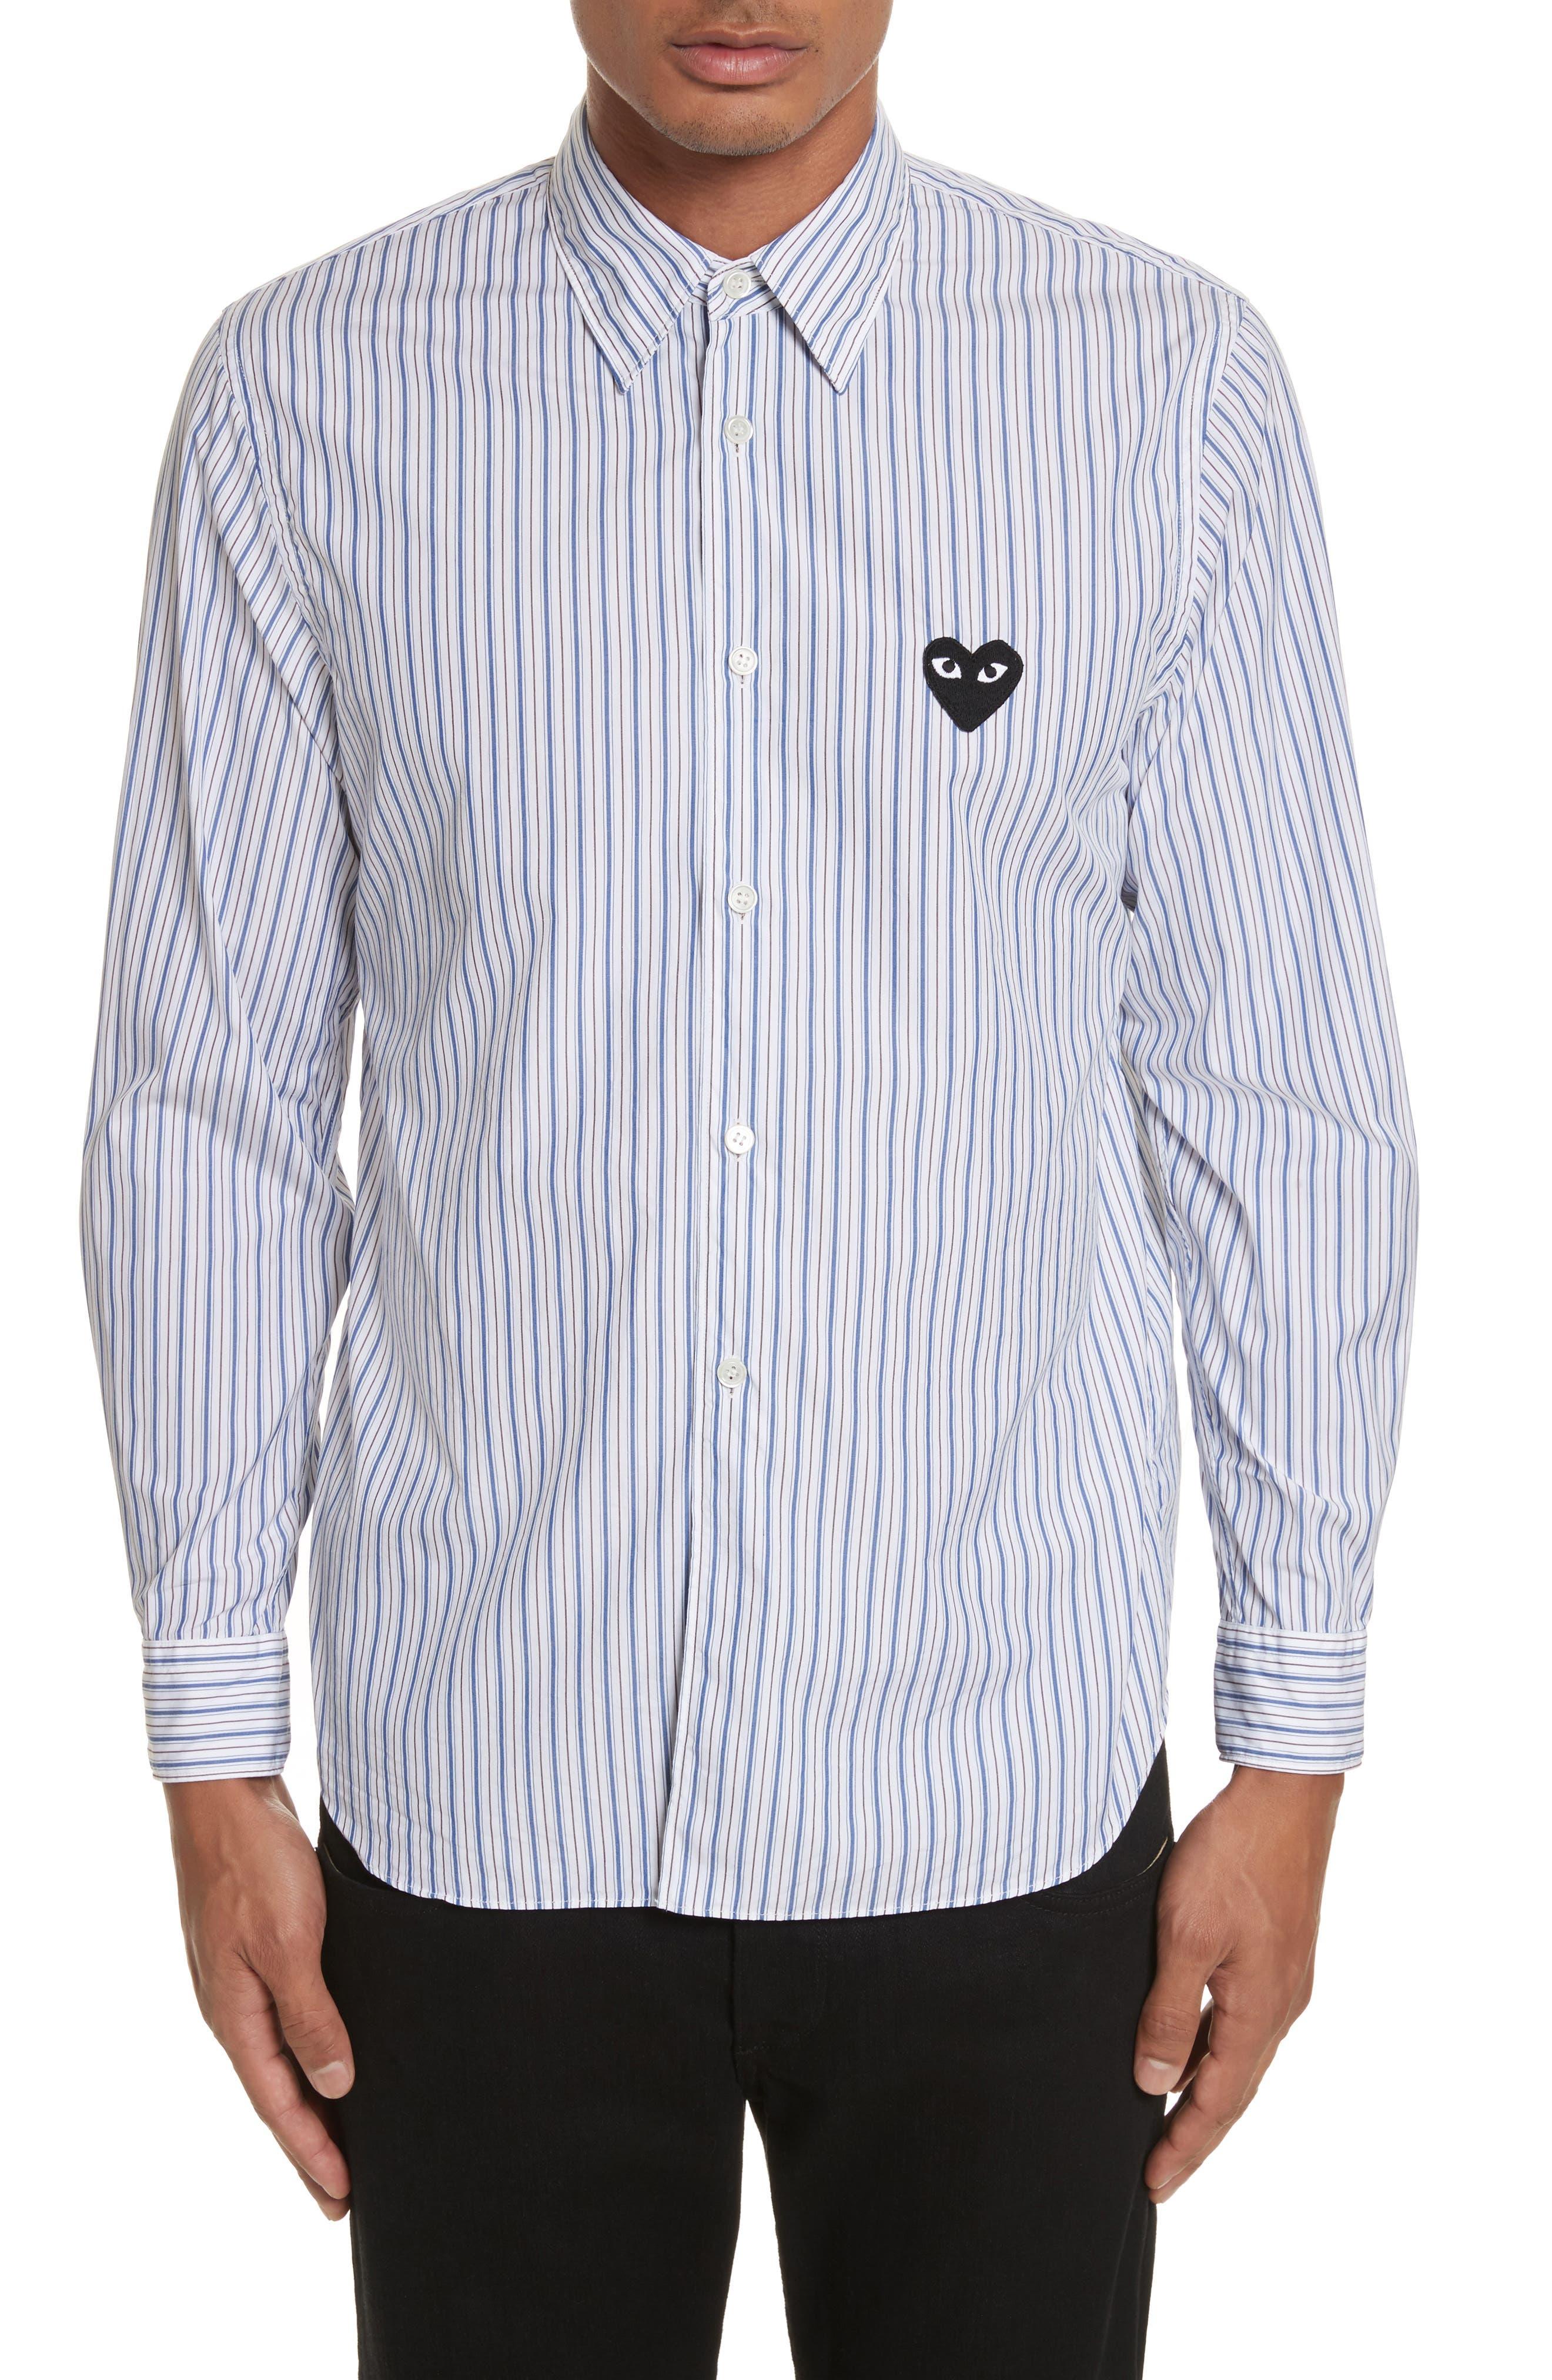 PLAY Black Heart Stripe Oxford Shirt,                             Main thumbnail 1, color,                             Blue